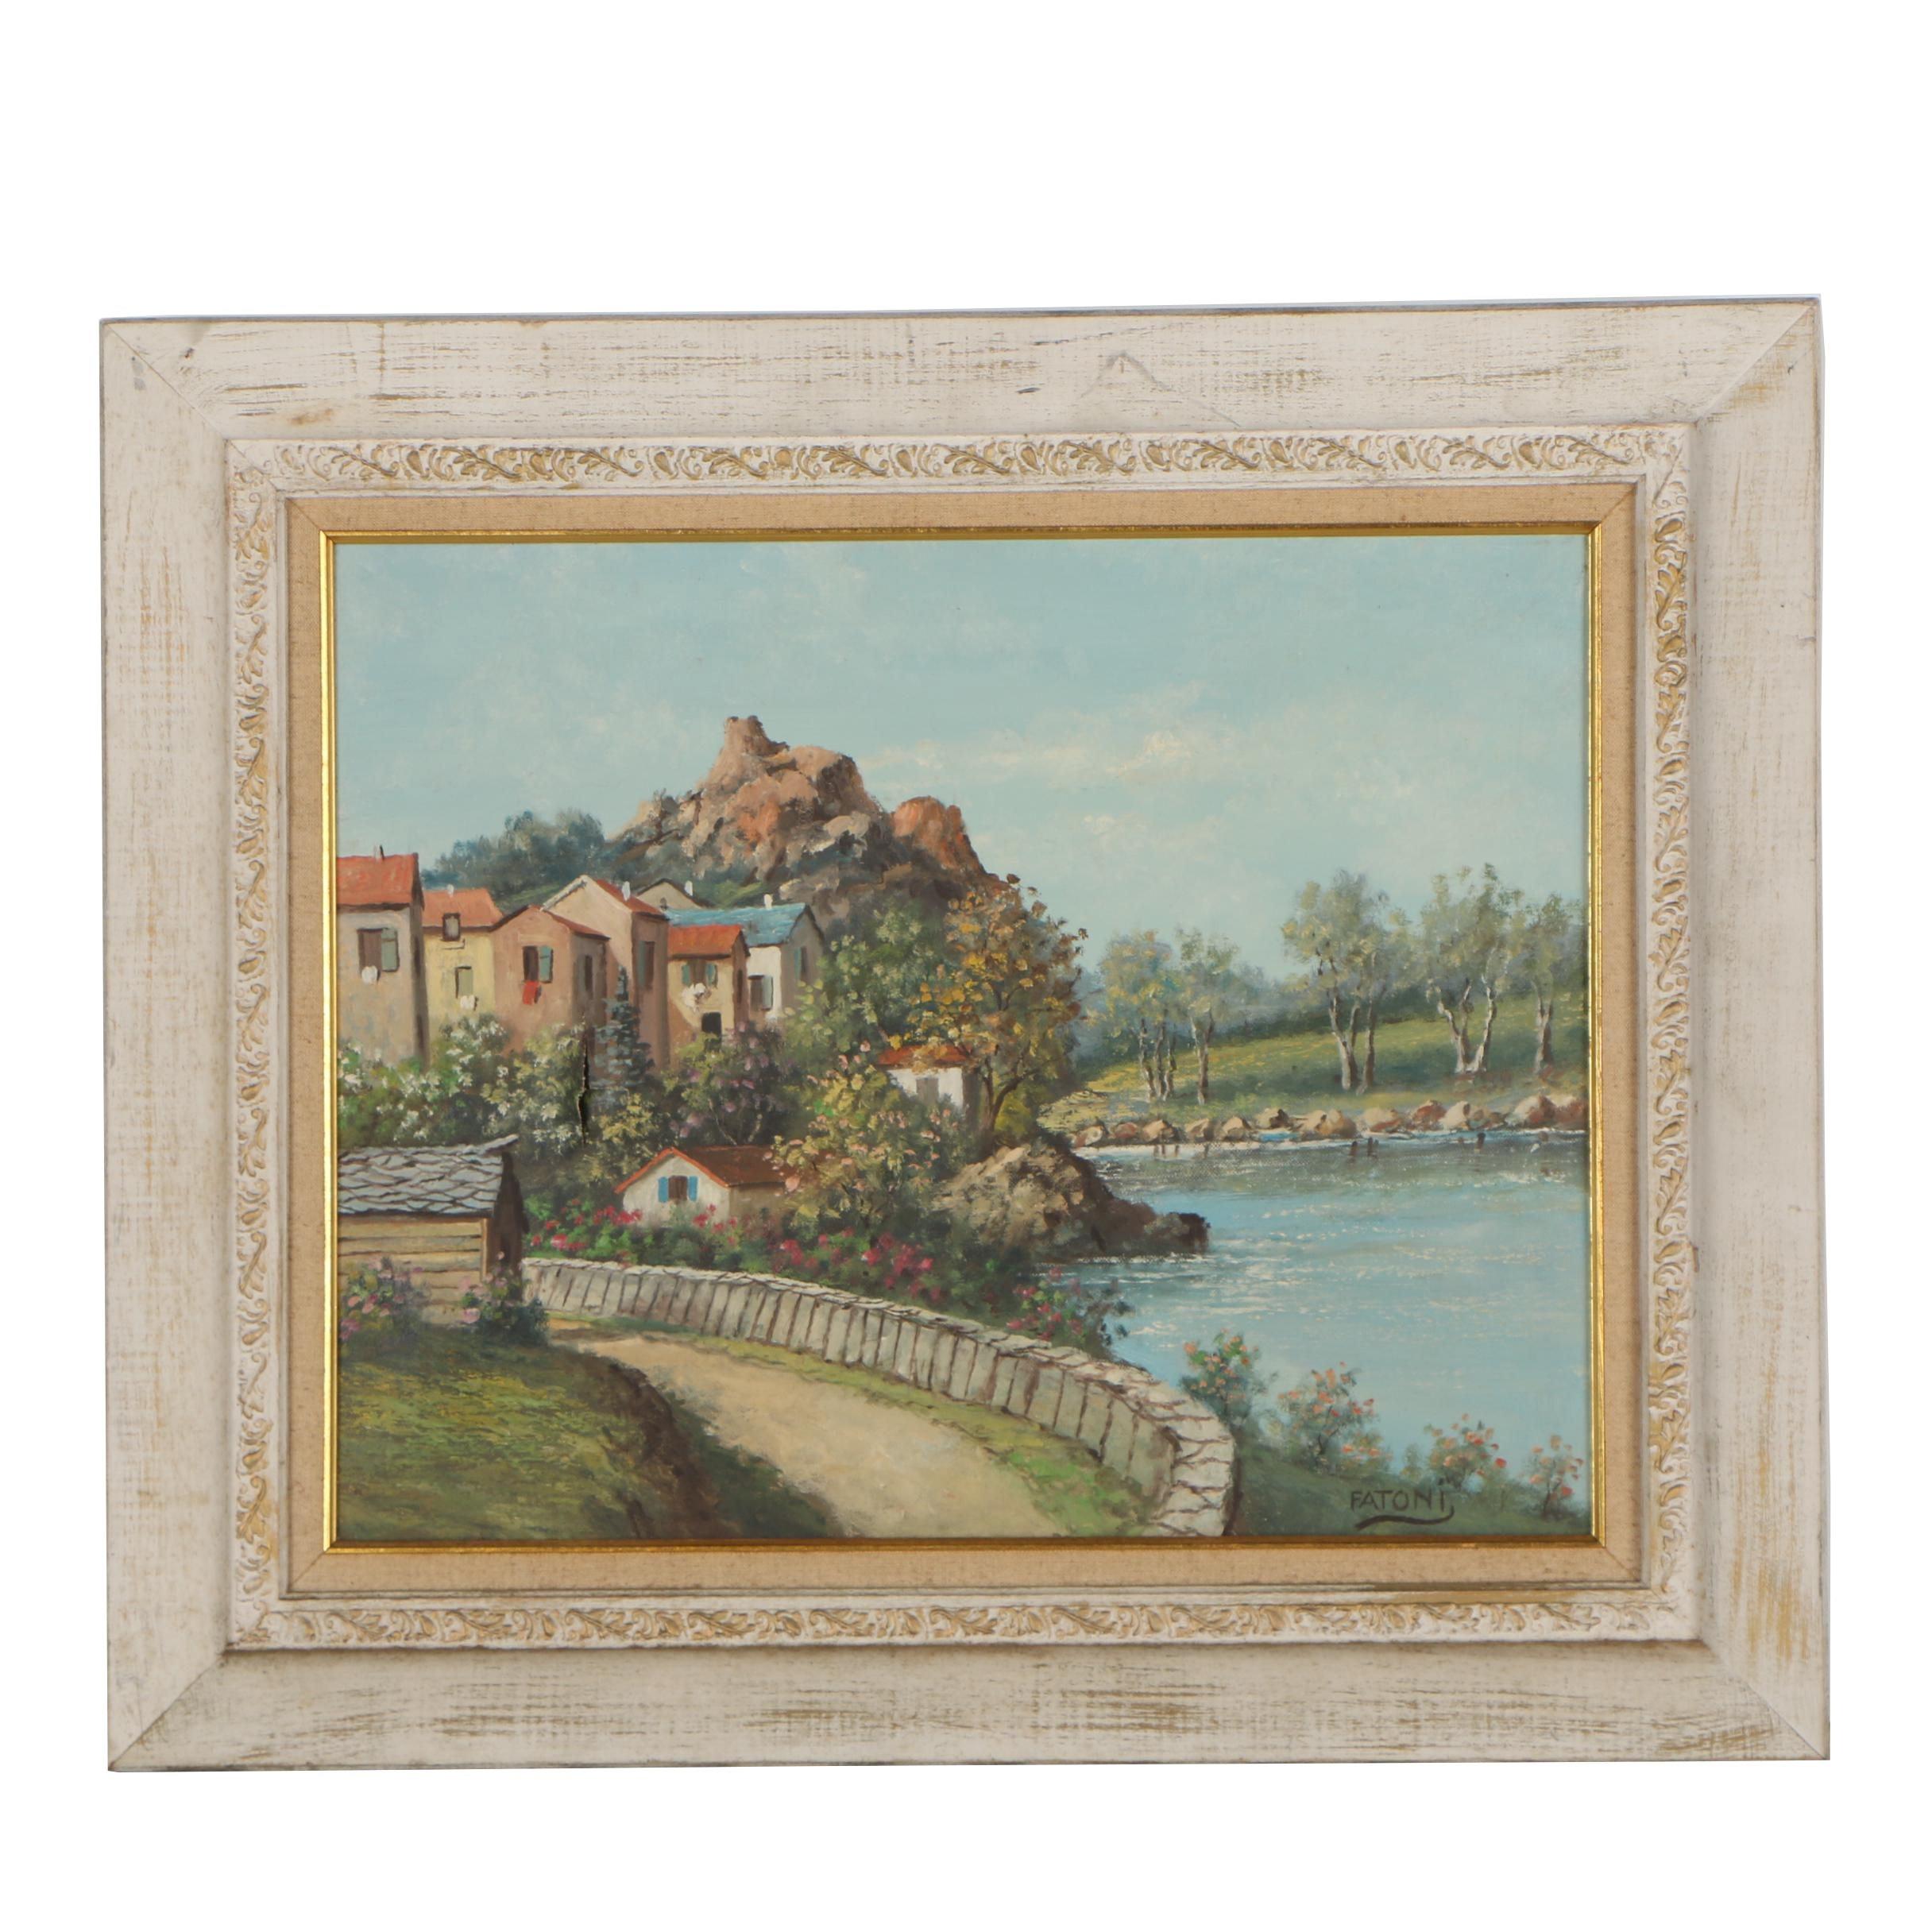 Fatoni Landscape Oil Painting